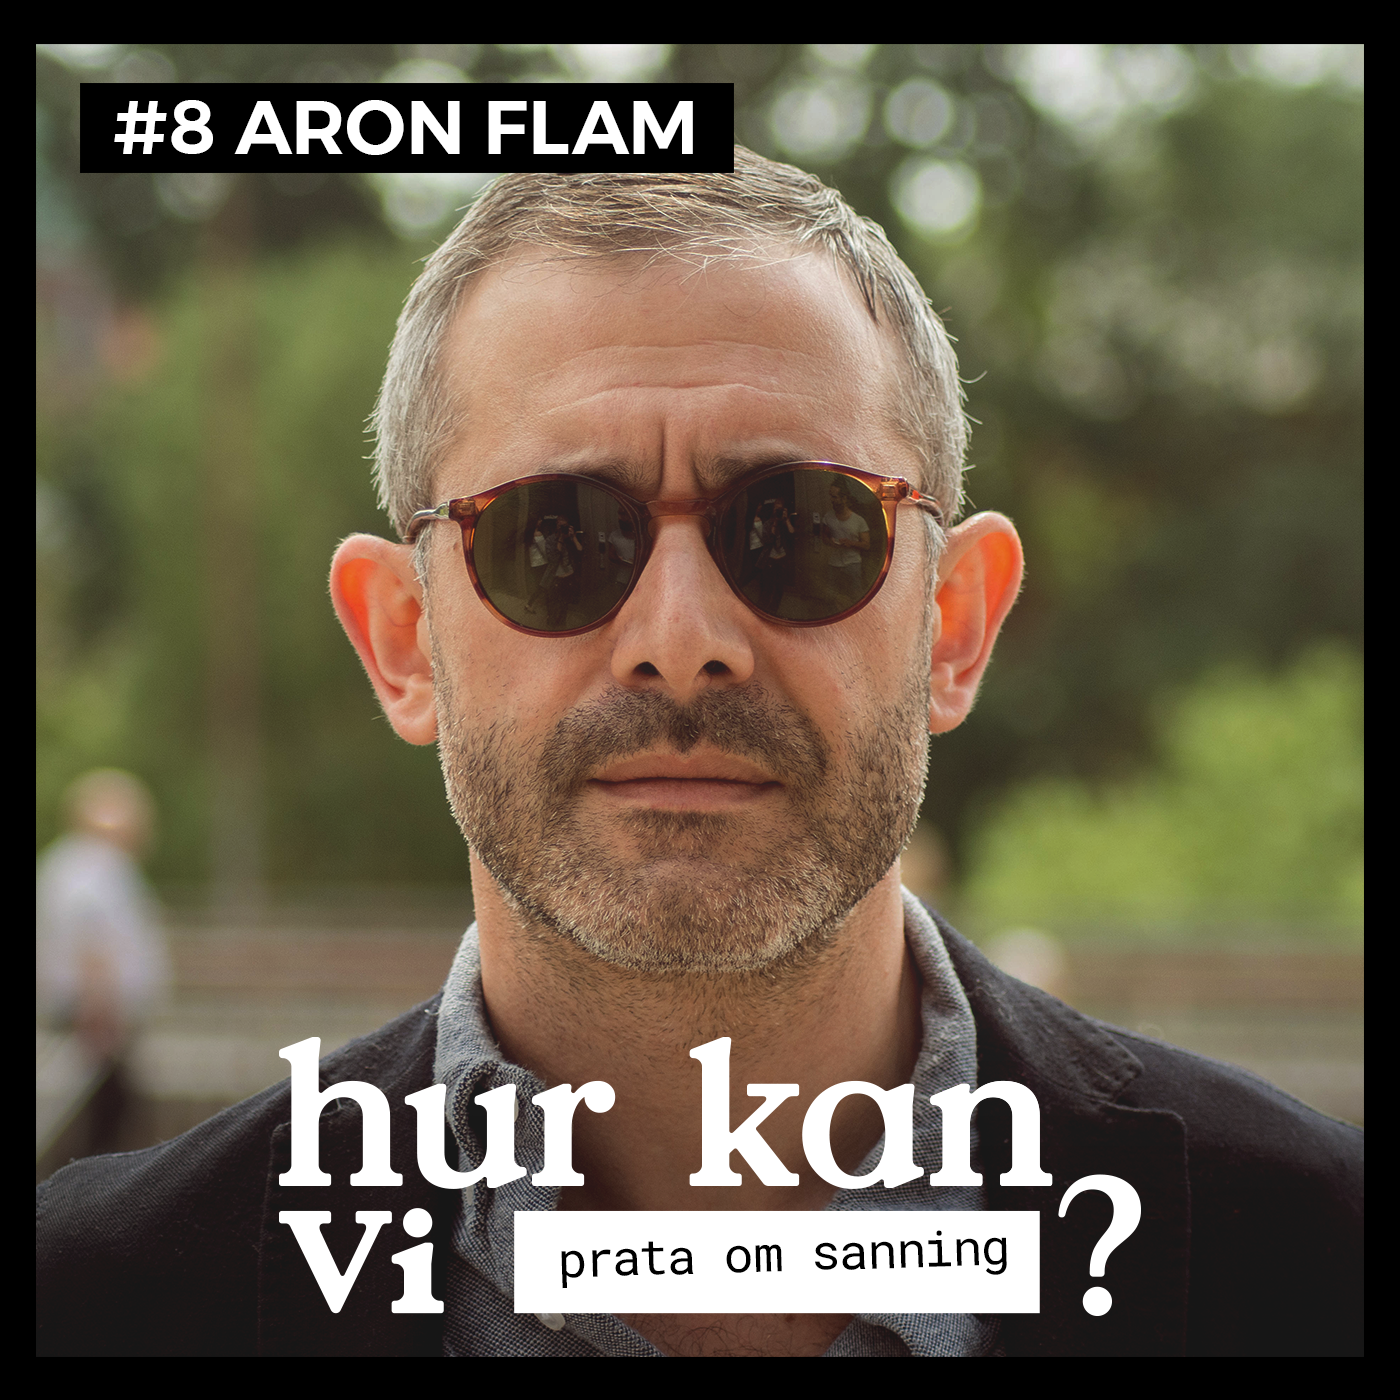 Hur Kan vi prata om sanning Aron Flam Navid Modiri.png